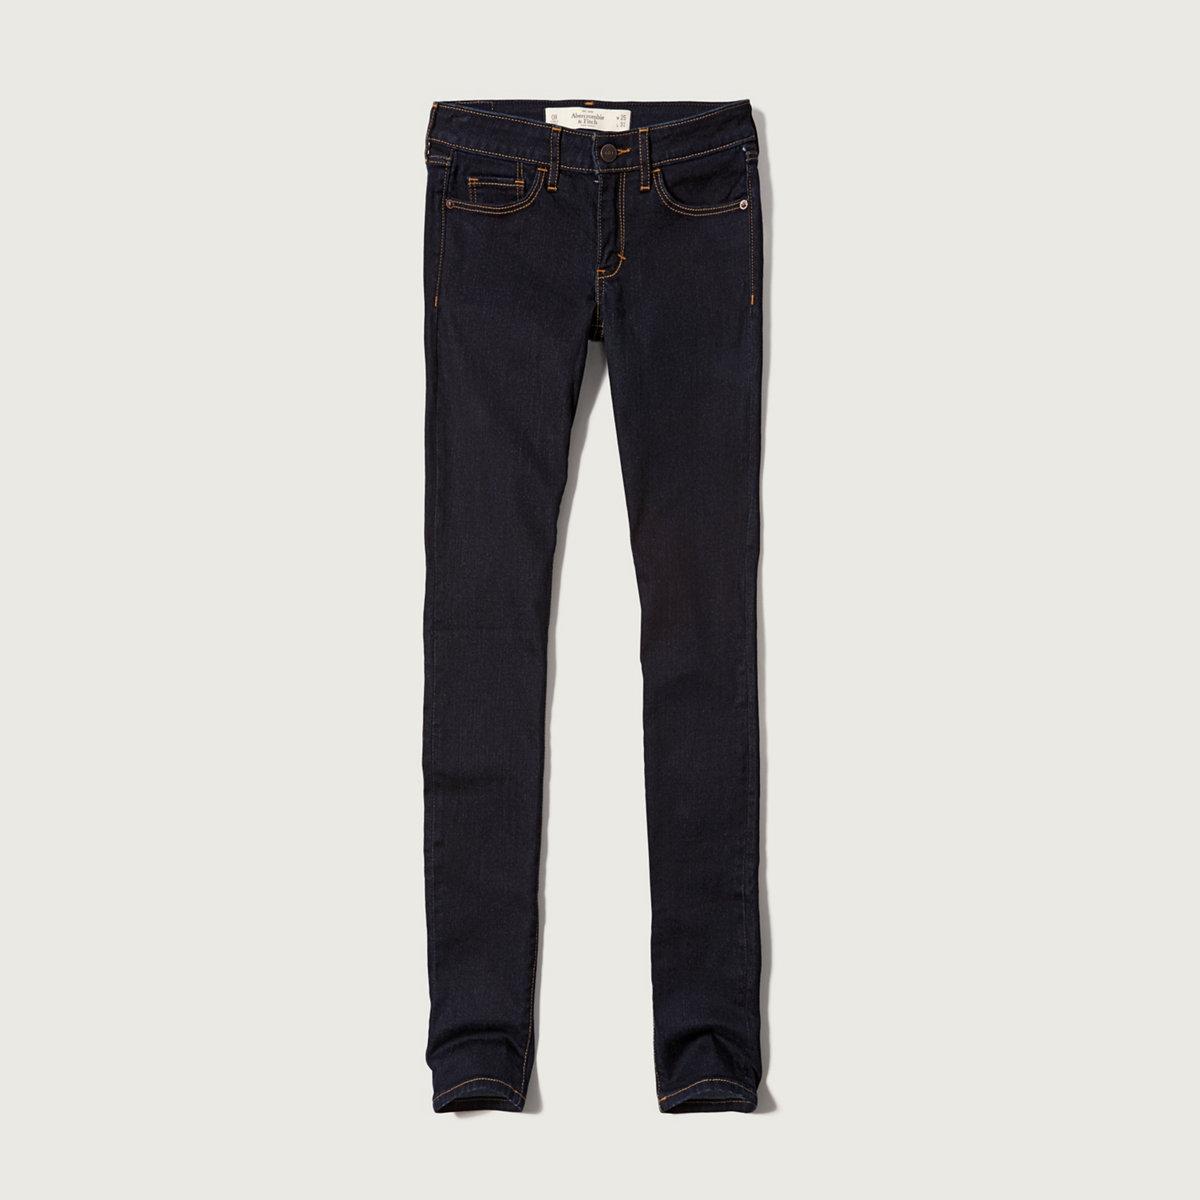 A&F Super Skinny Jeans